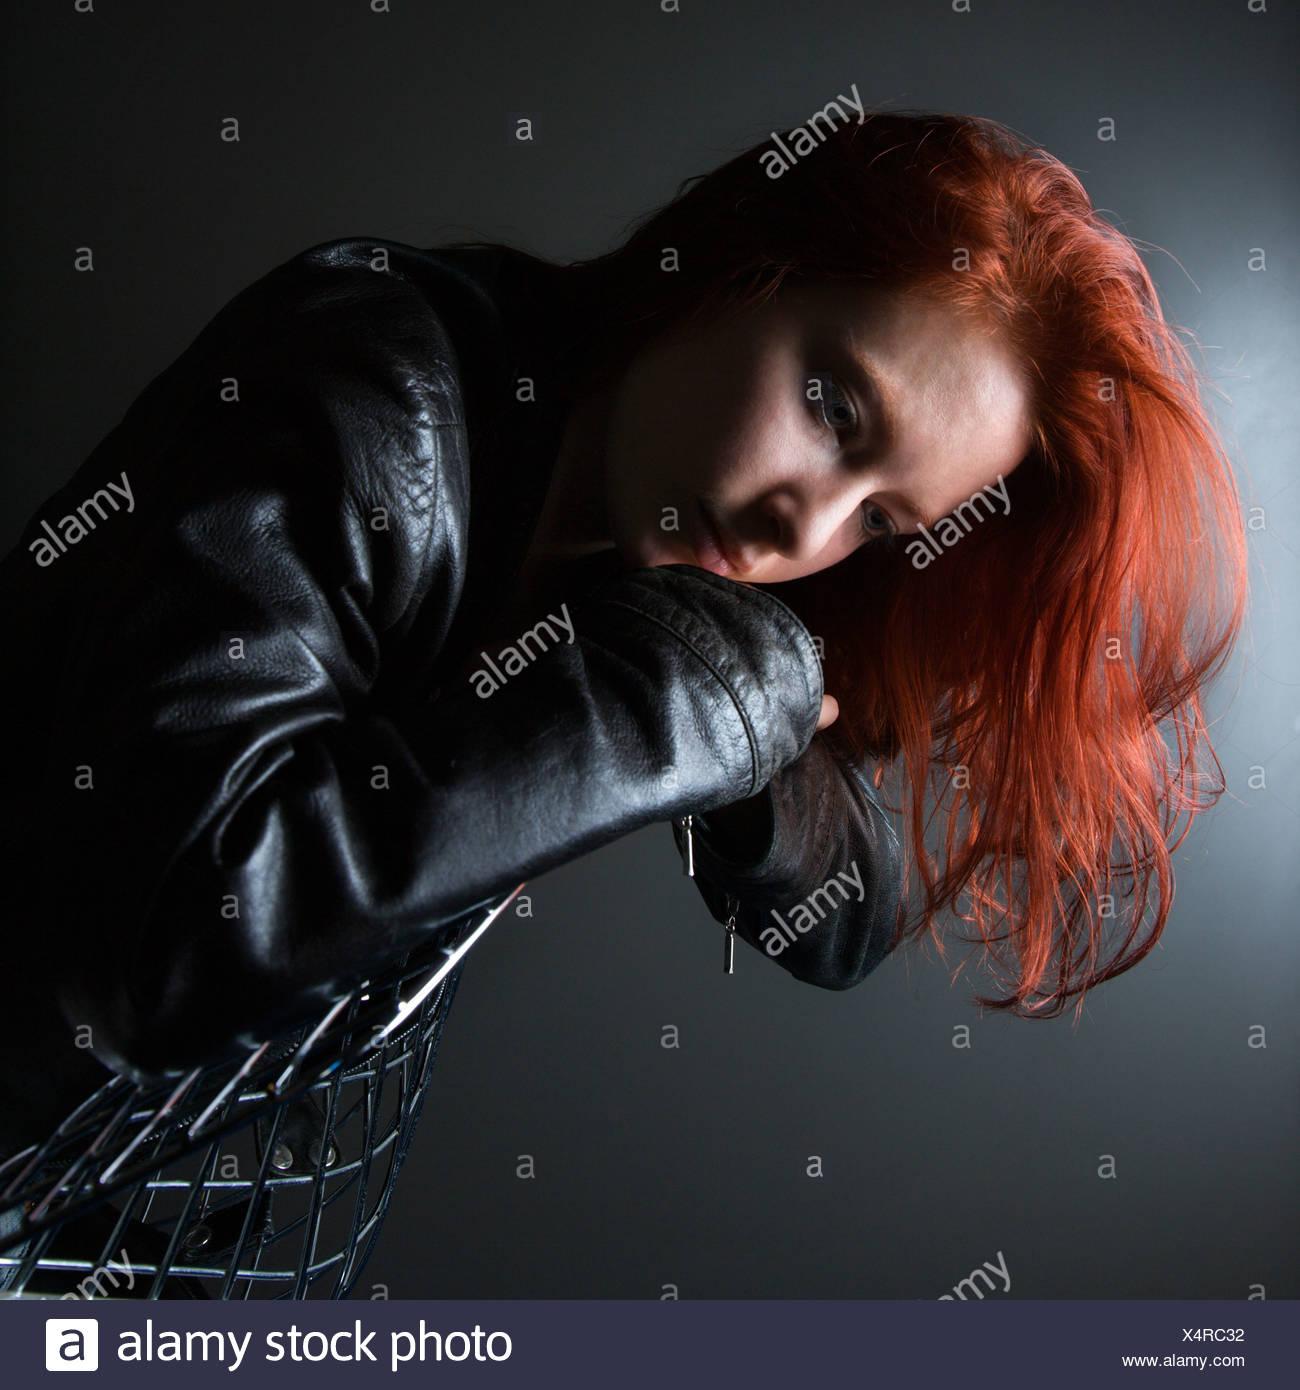 Hübsche rothaarige junge Frau trägt Lederjacke über Rückseite Stuhl hängen Stockfoto